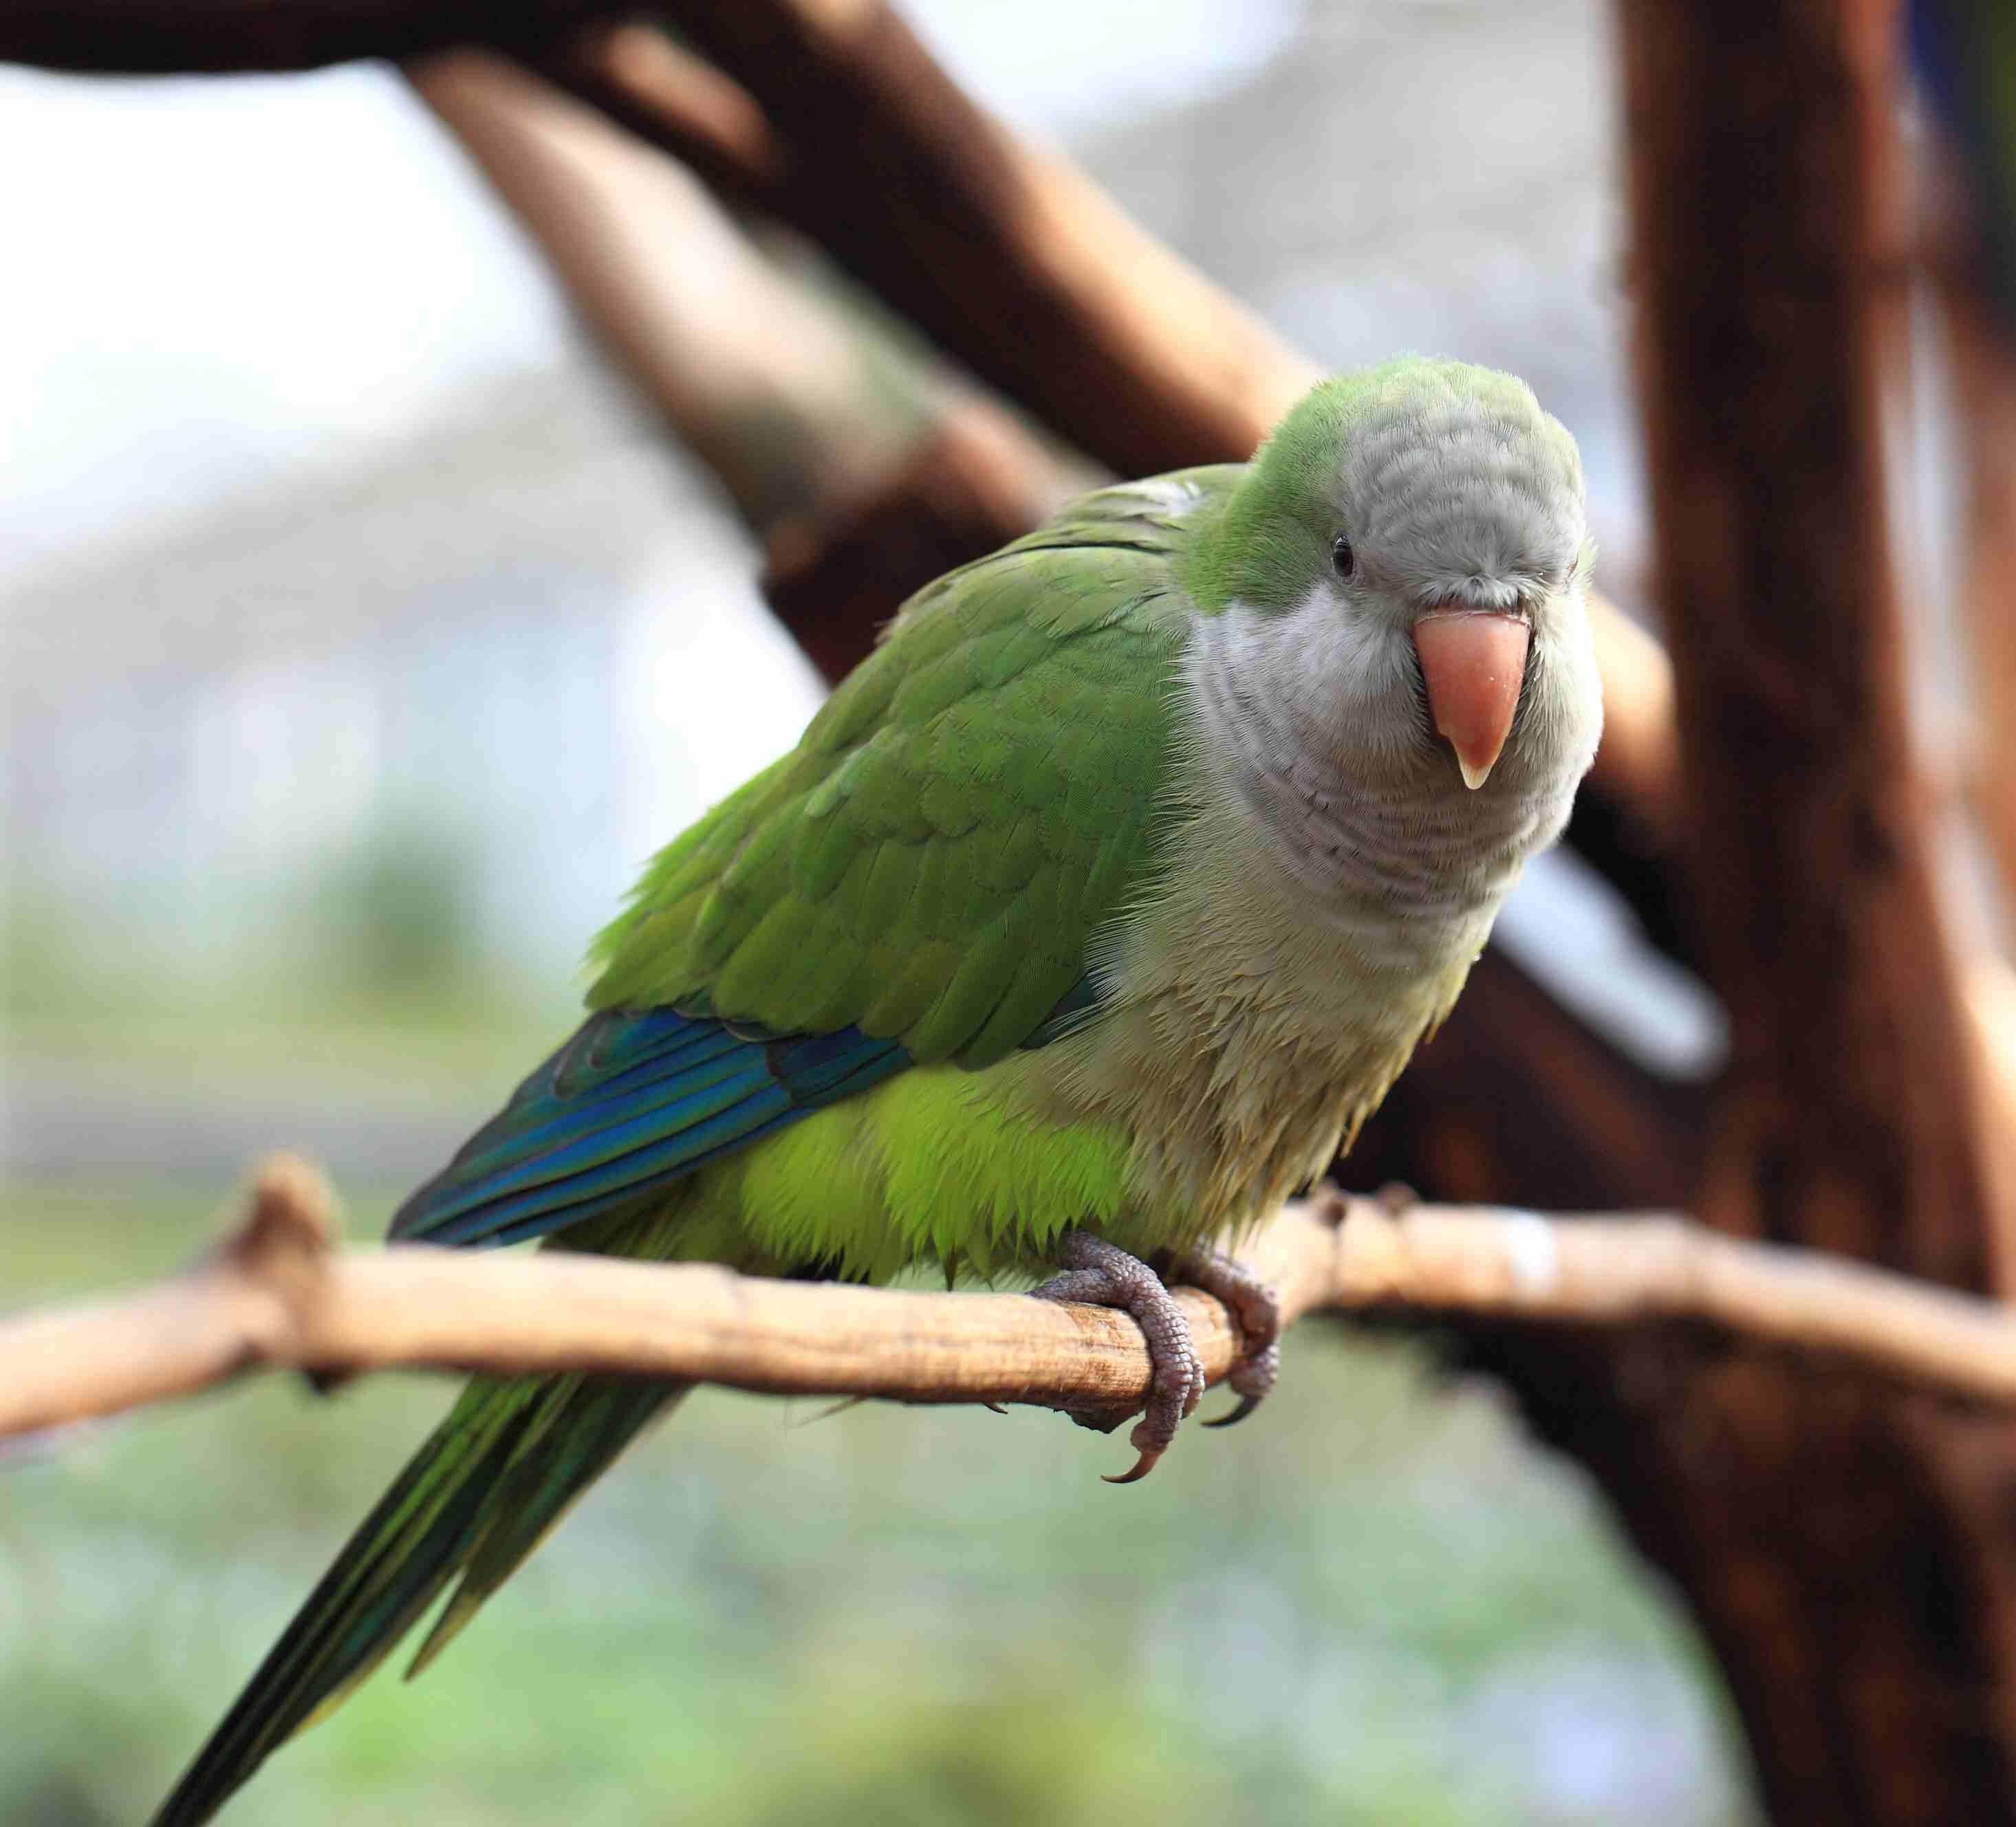 Quaker parrot on a branch